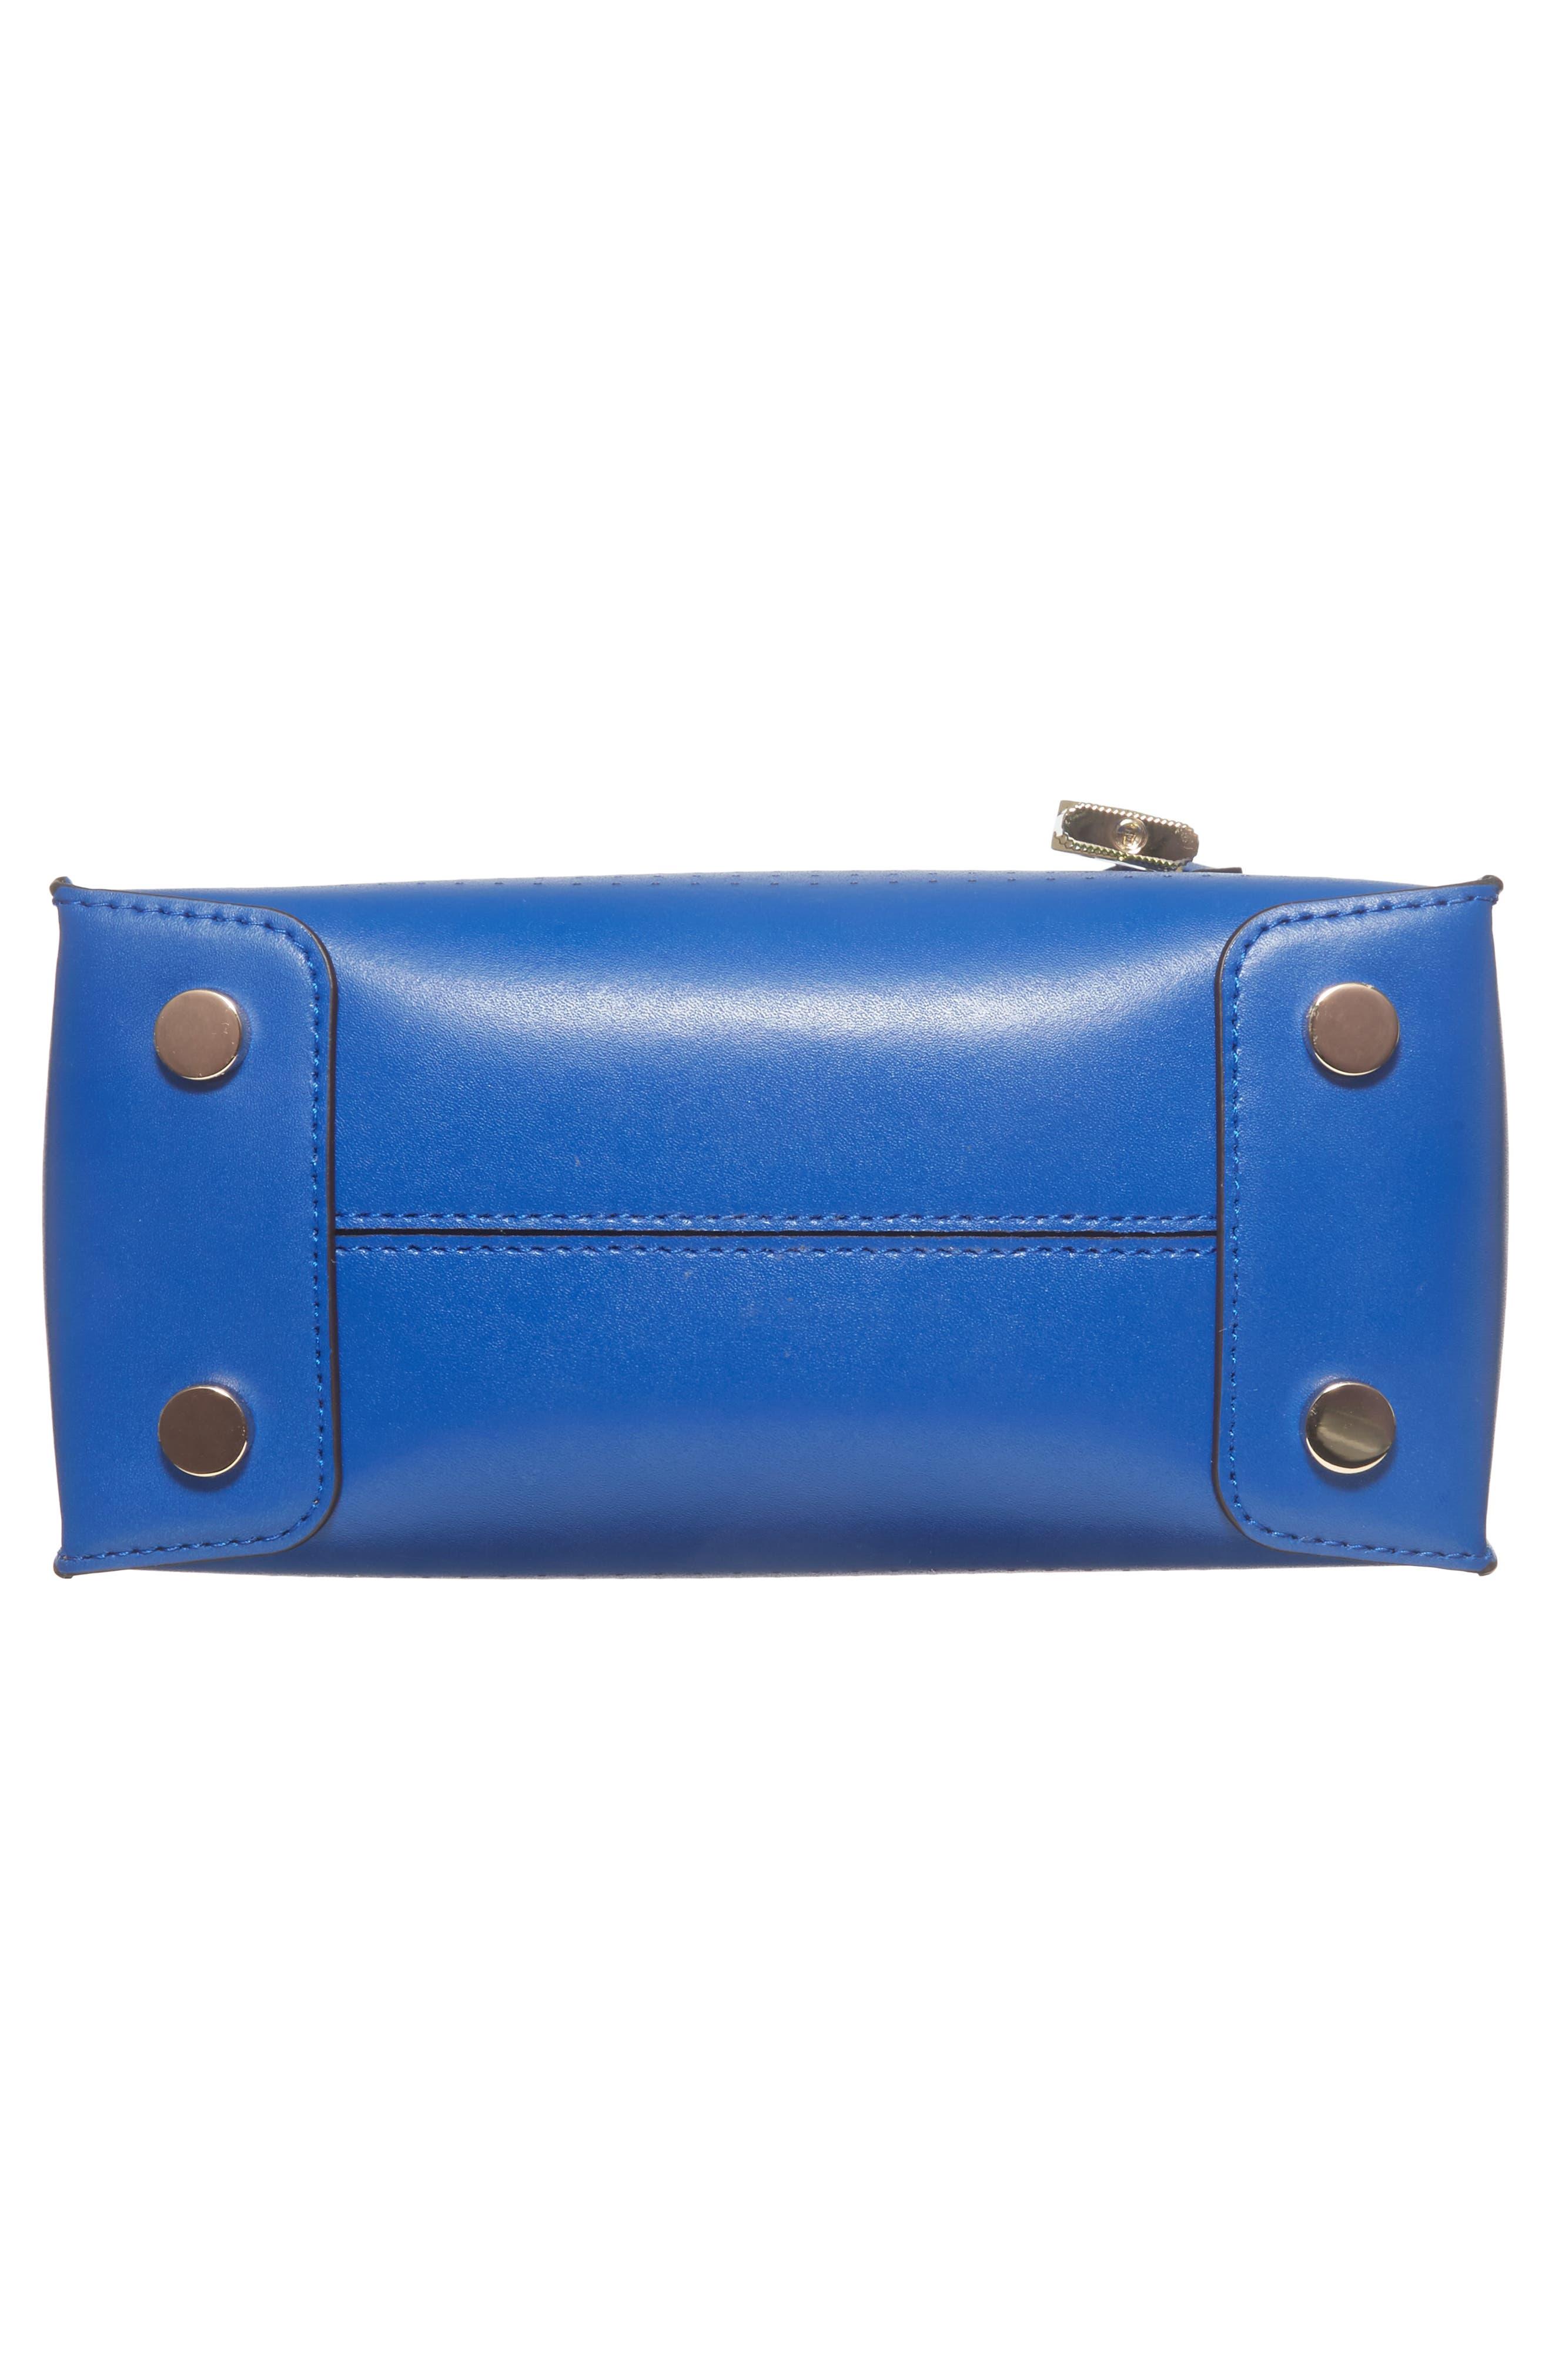 MICHAEL Michael Kors Medium Mercer Leather Crossbody Bag,                             Alternate thumbnail 6, color,                             Electric Blue